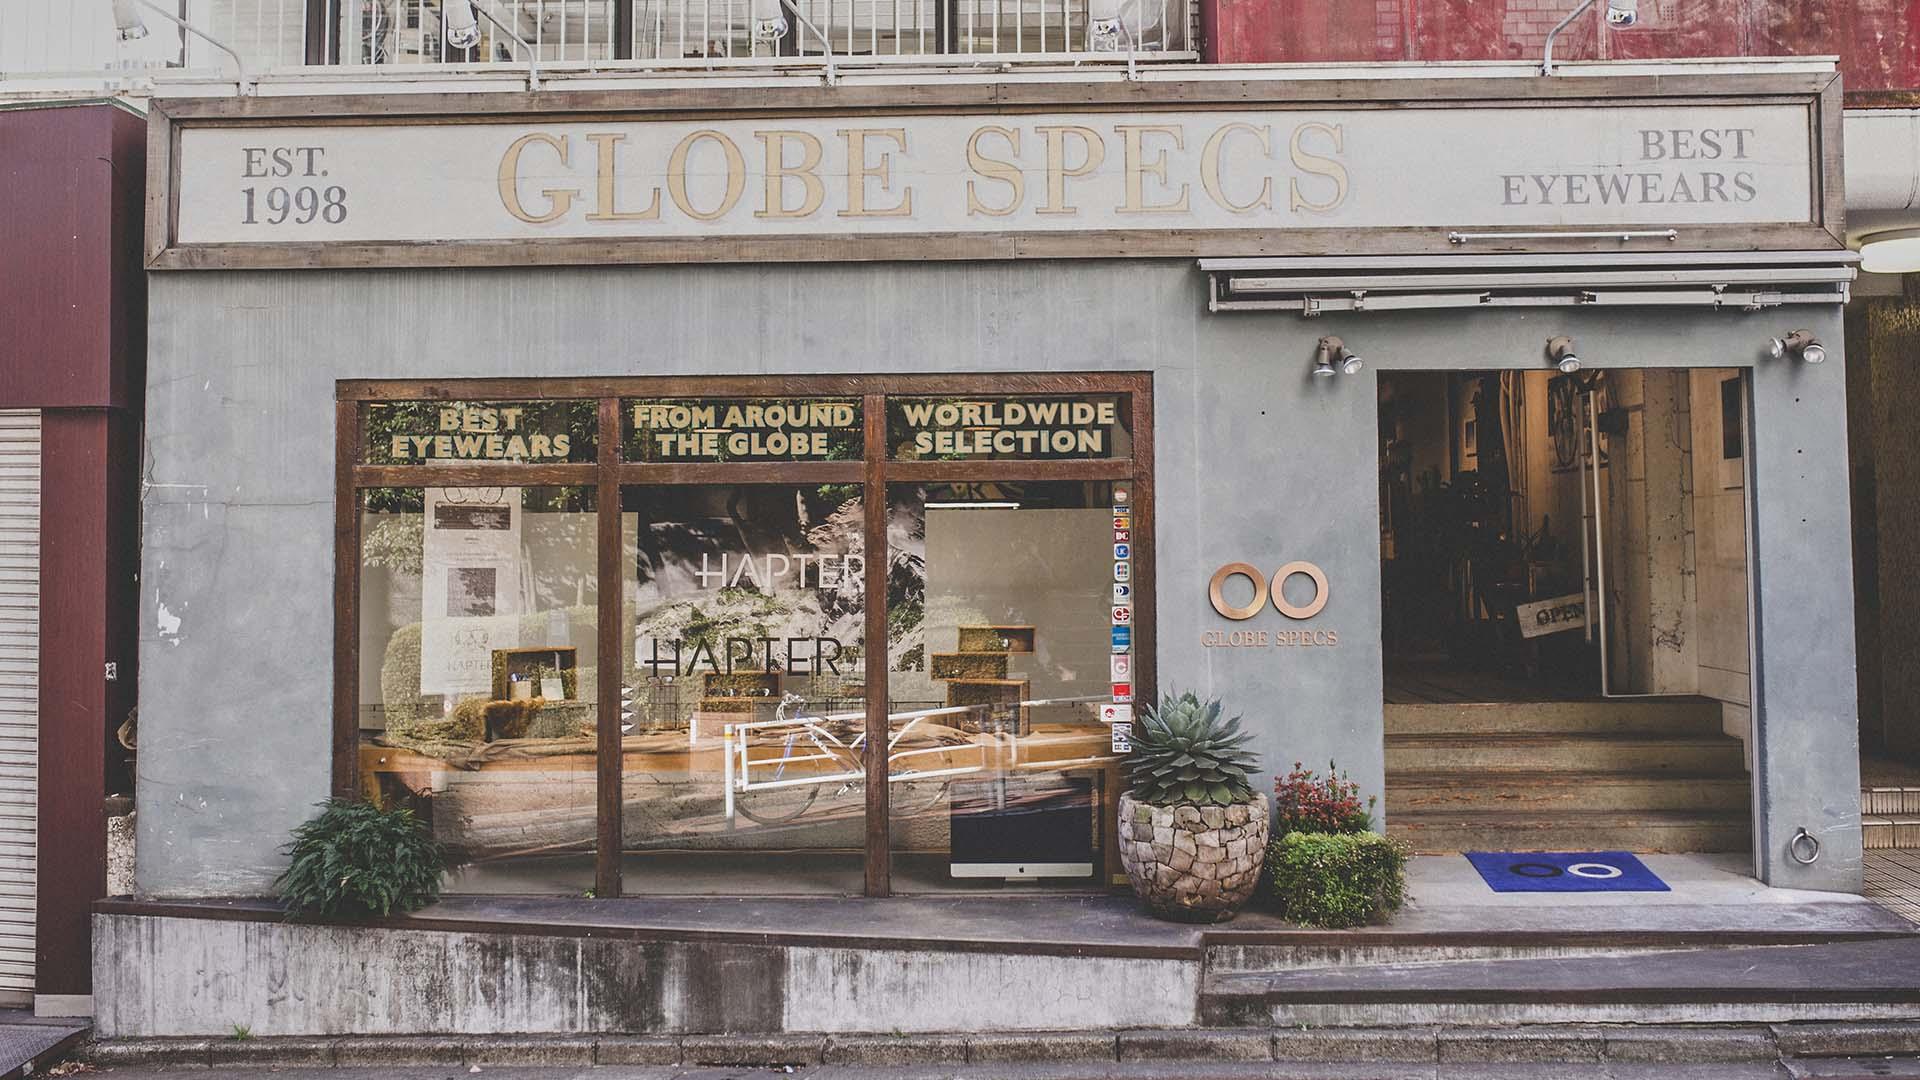 Globe Specs, An optical shop in Tokyo